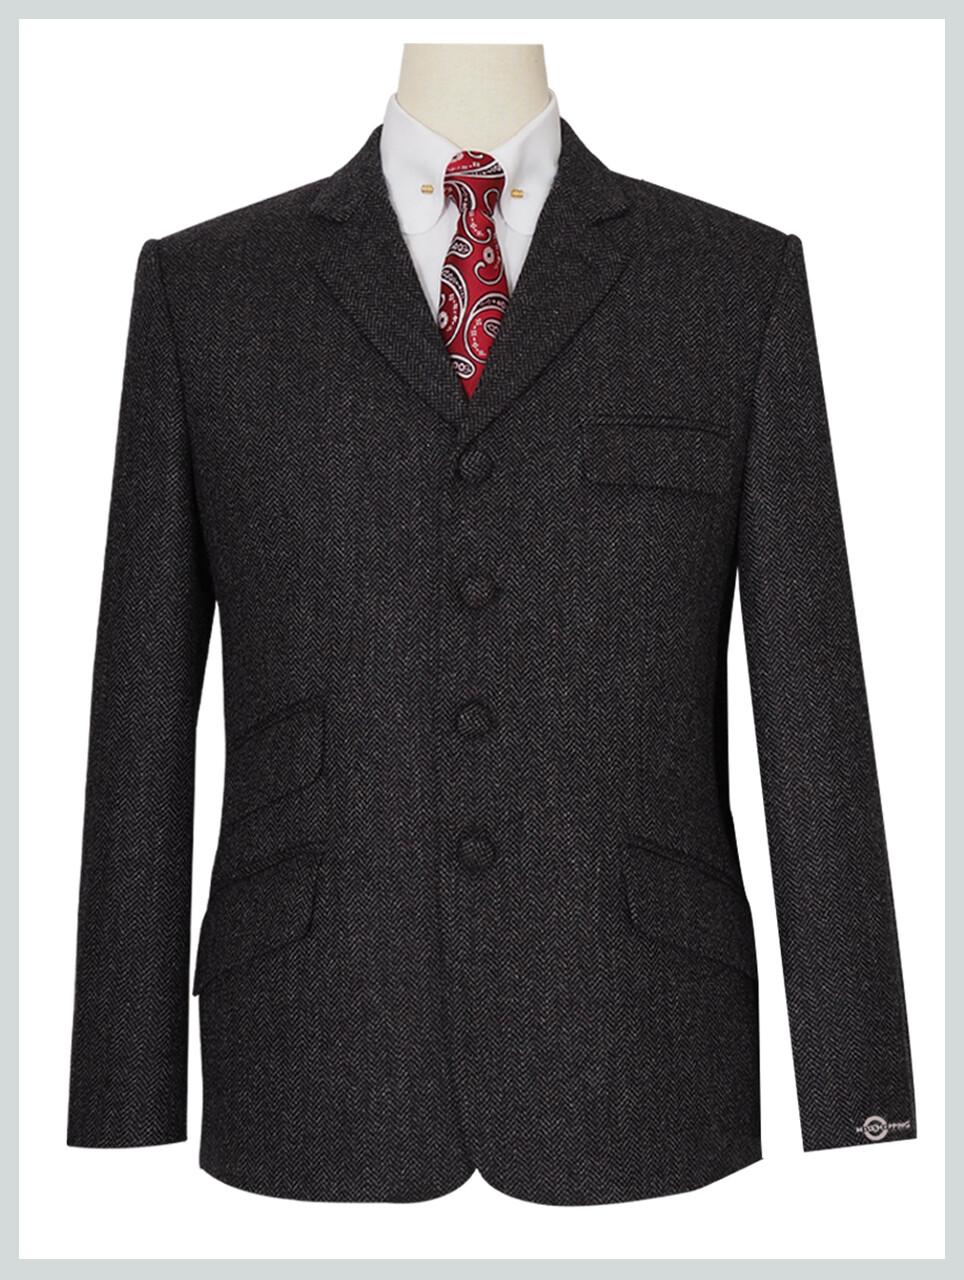 Charcoal Grey 4 Button Herringbone Tweed  Jacket For Man